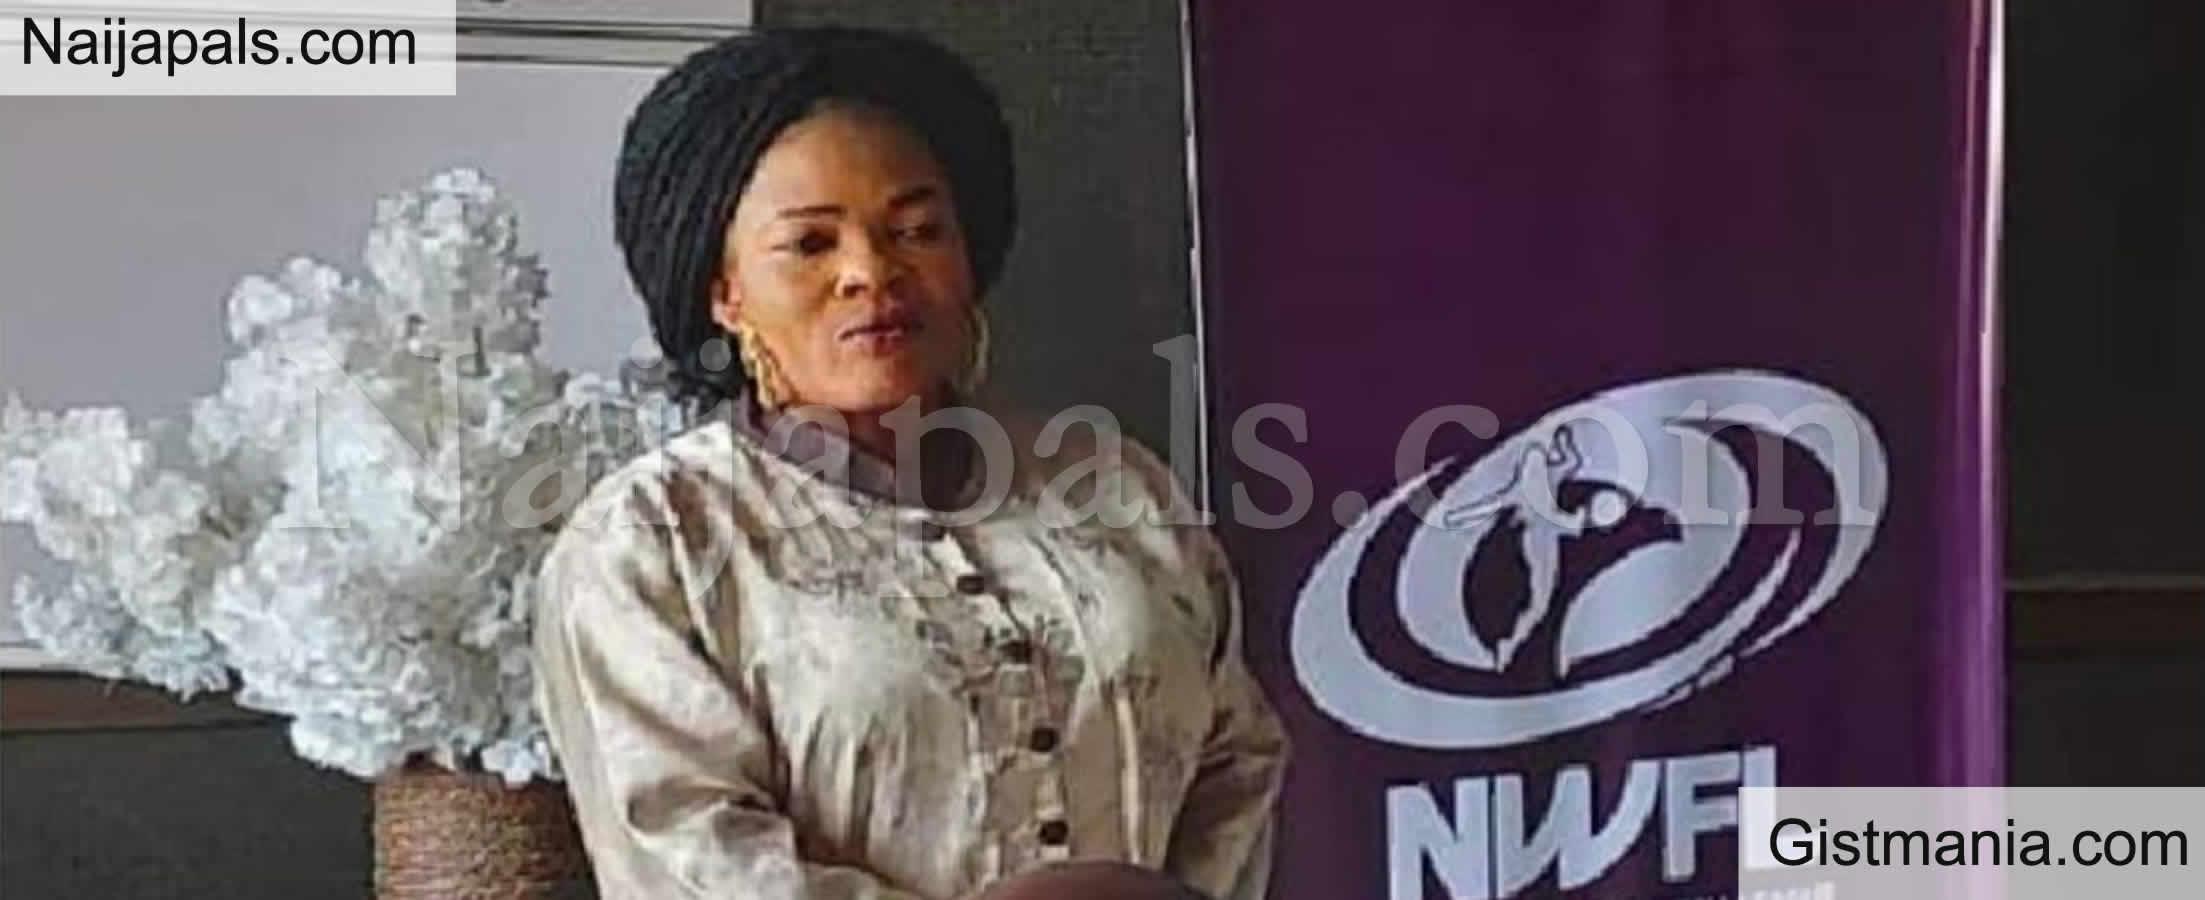 <img alt='.' class='lazyload' data-src='https://img.gistmania.com/emot/shocked.gif' /> SAD: <b>Nigerian Women Football League (NWFL) Board Member, Henrietta Ukaigwe Is Dead</b>